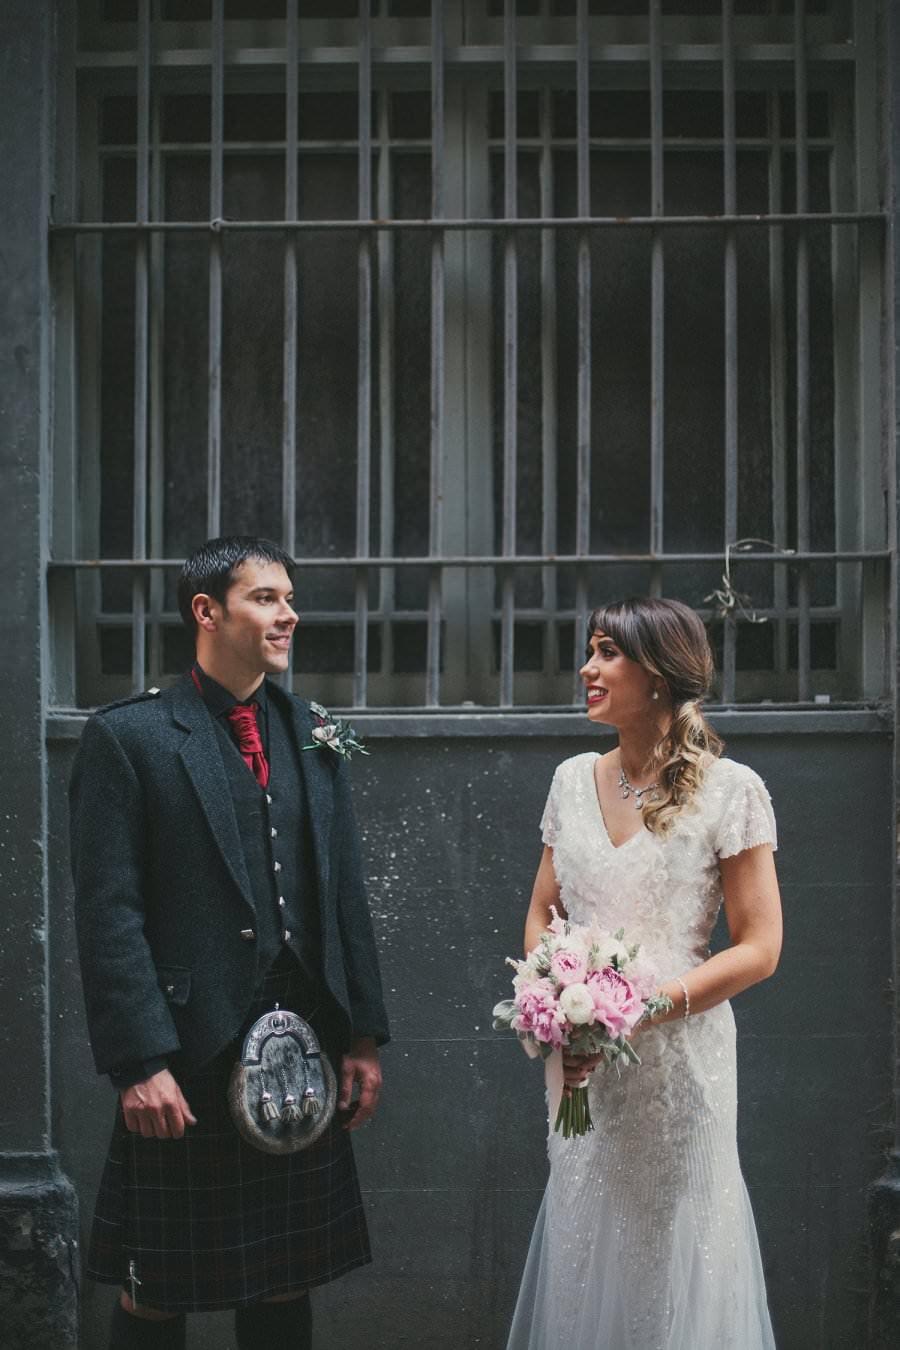 29-glasgow-artistic-wedding-photography-59